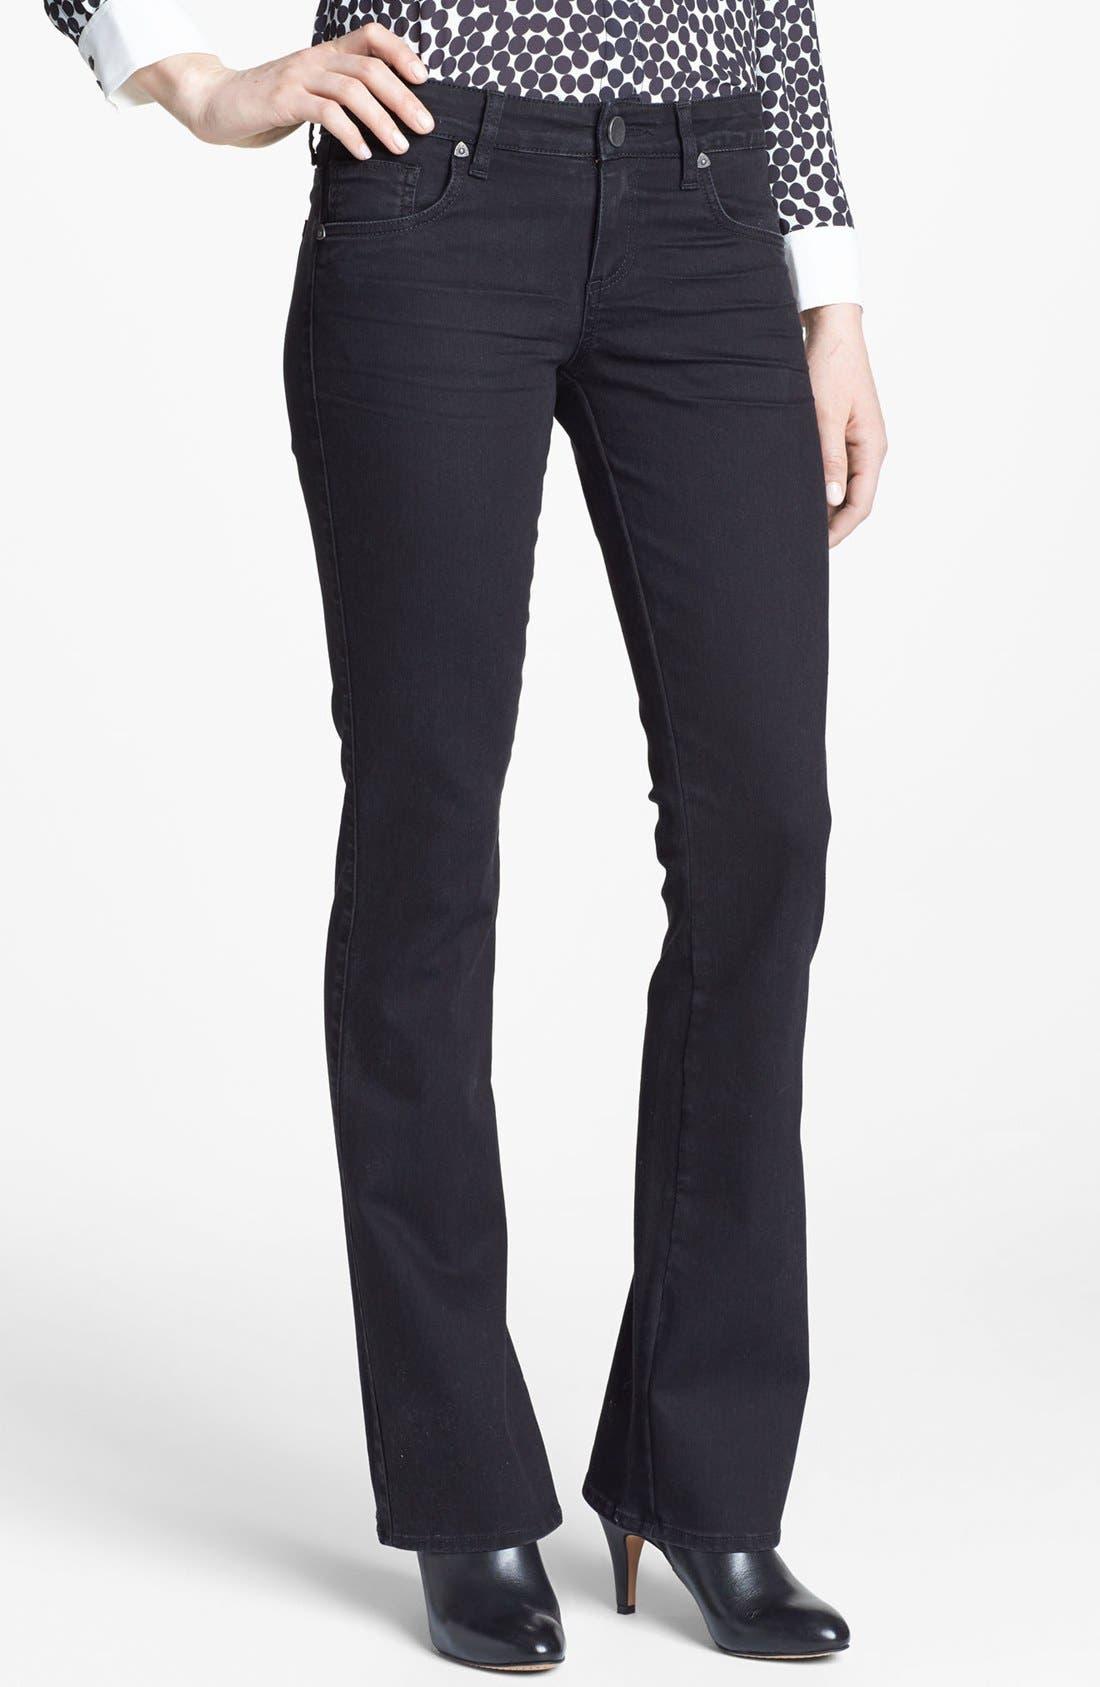 Main Image - KUT from the Kloth Farrah' Mini Bootcut Jeans (Black)